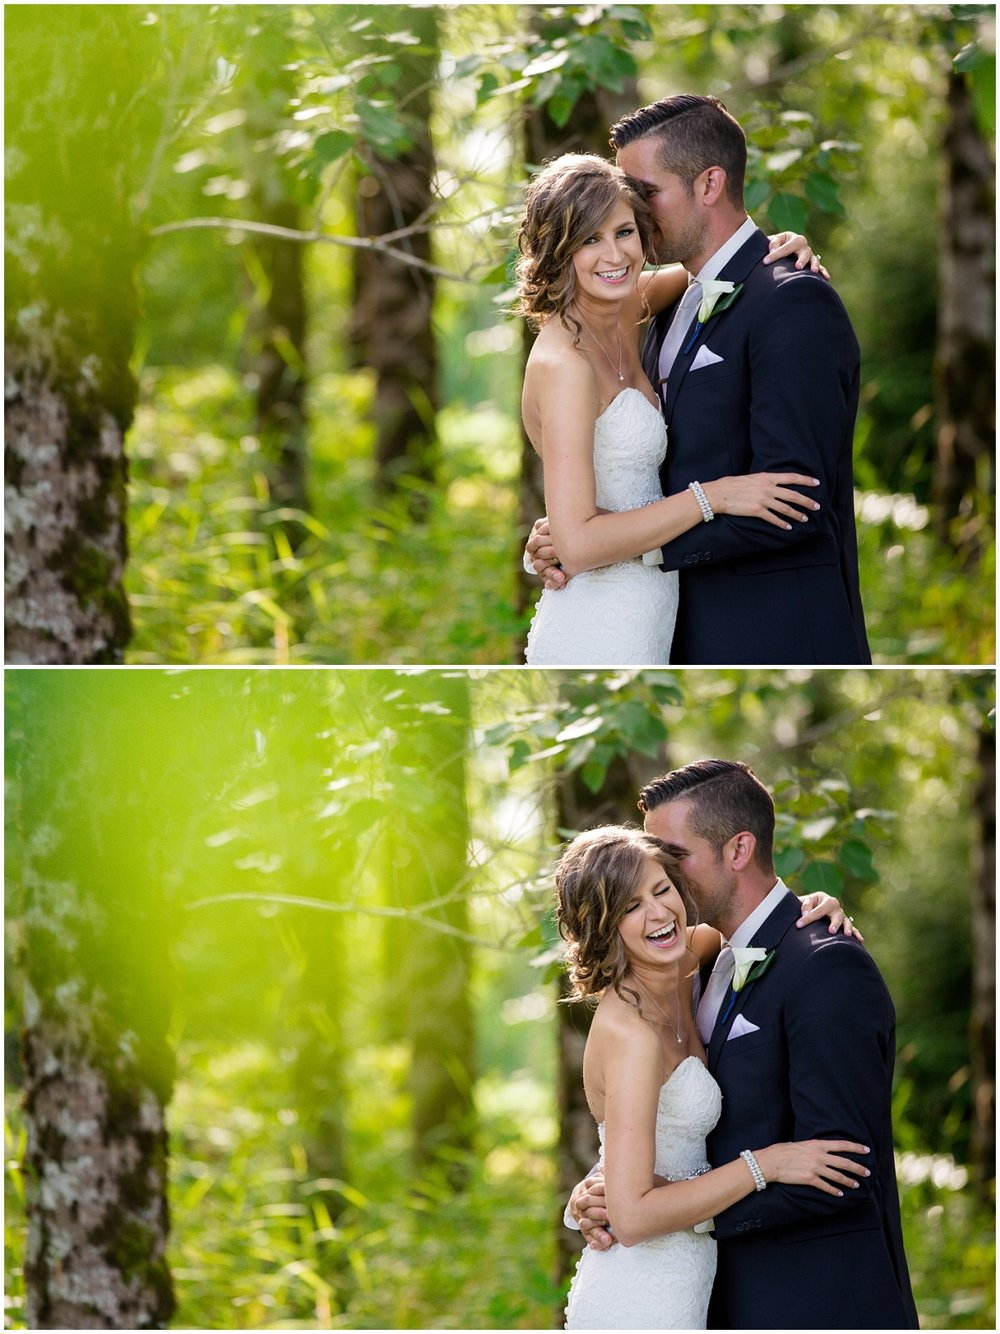 Amazing Day Photography - Redwoods Golf Course Wedding - Amanda and Dustin - Langley Wedding Photographer  (22).jpg